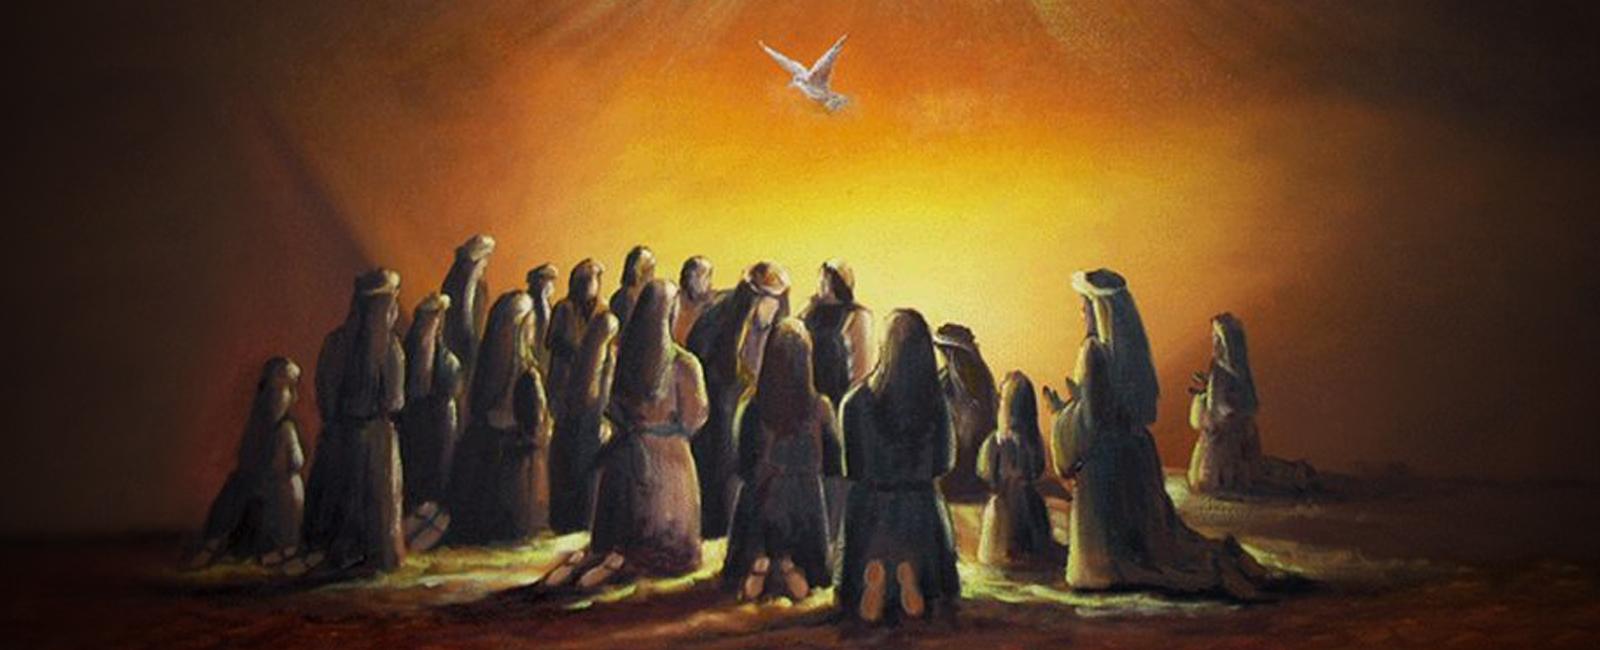 Parroquia El Altet - Evangelio 20 de Mayo 2018